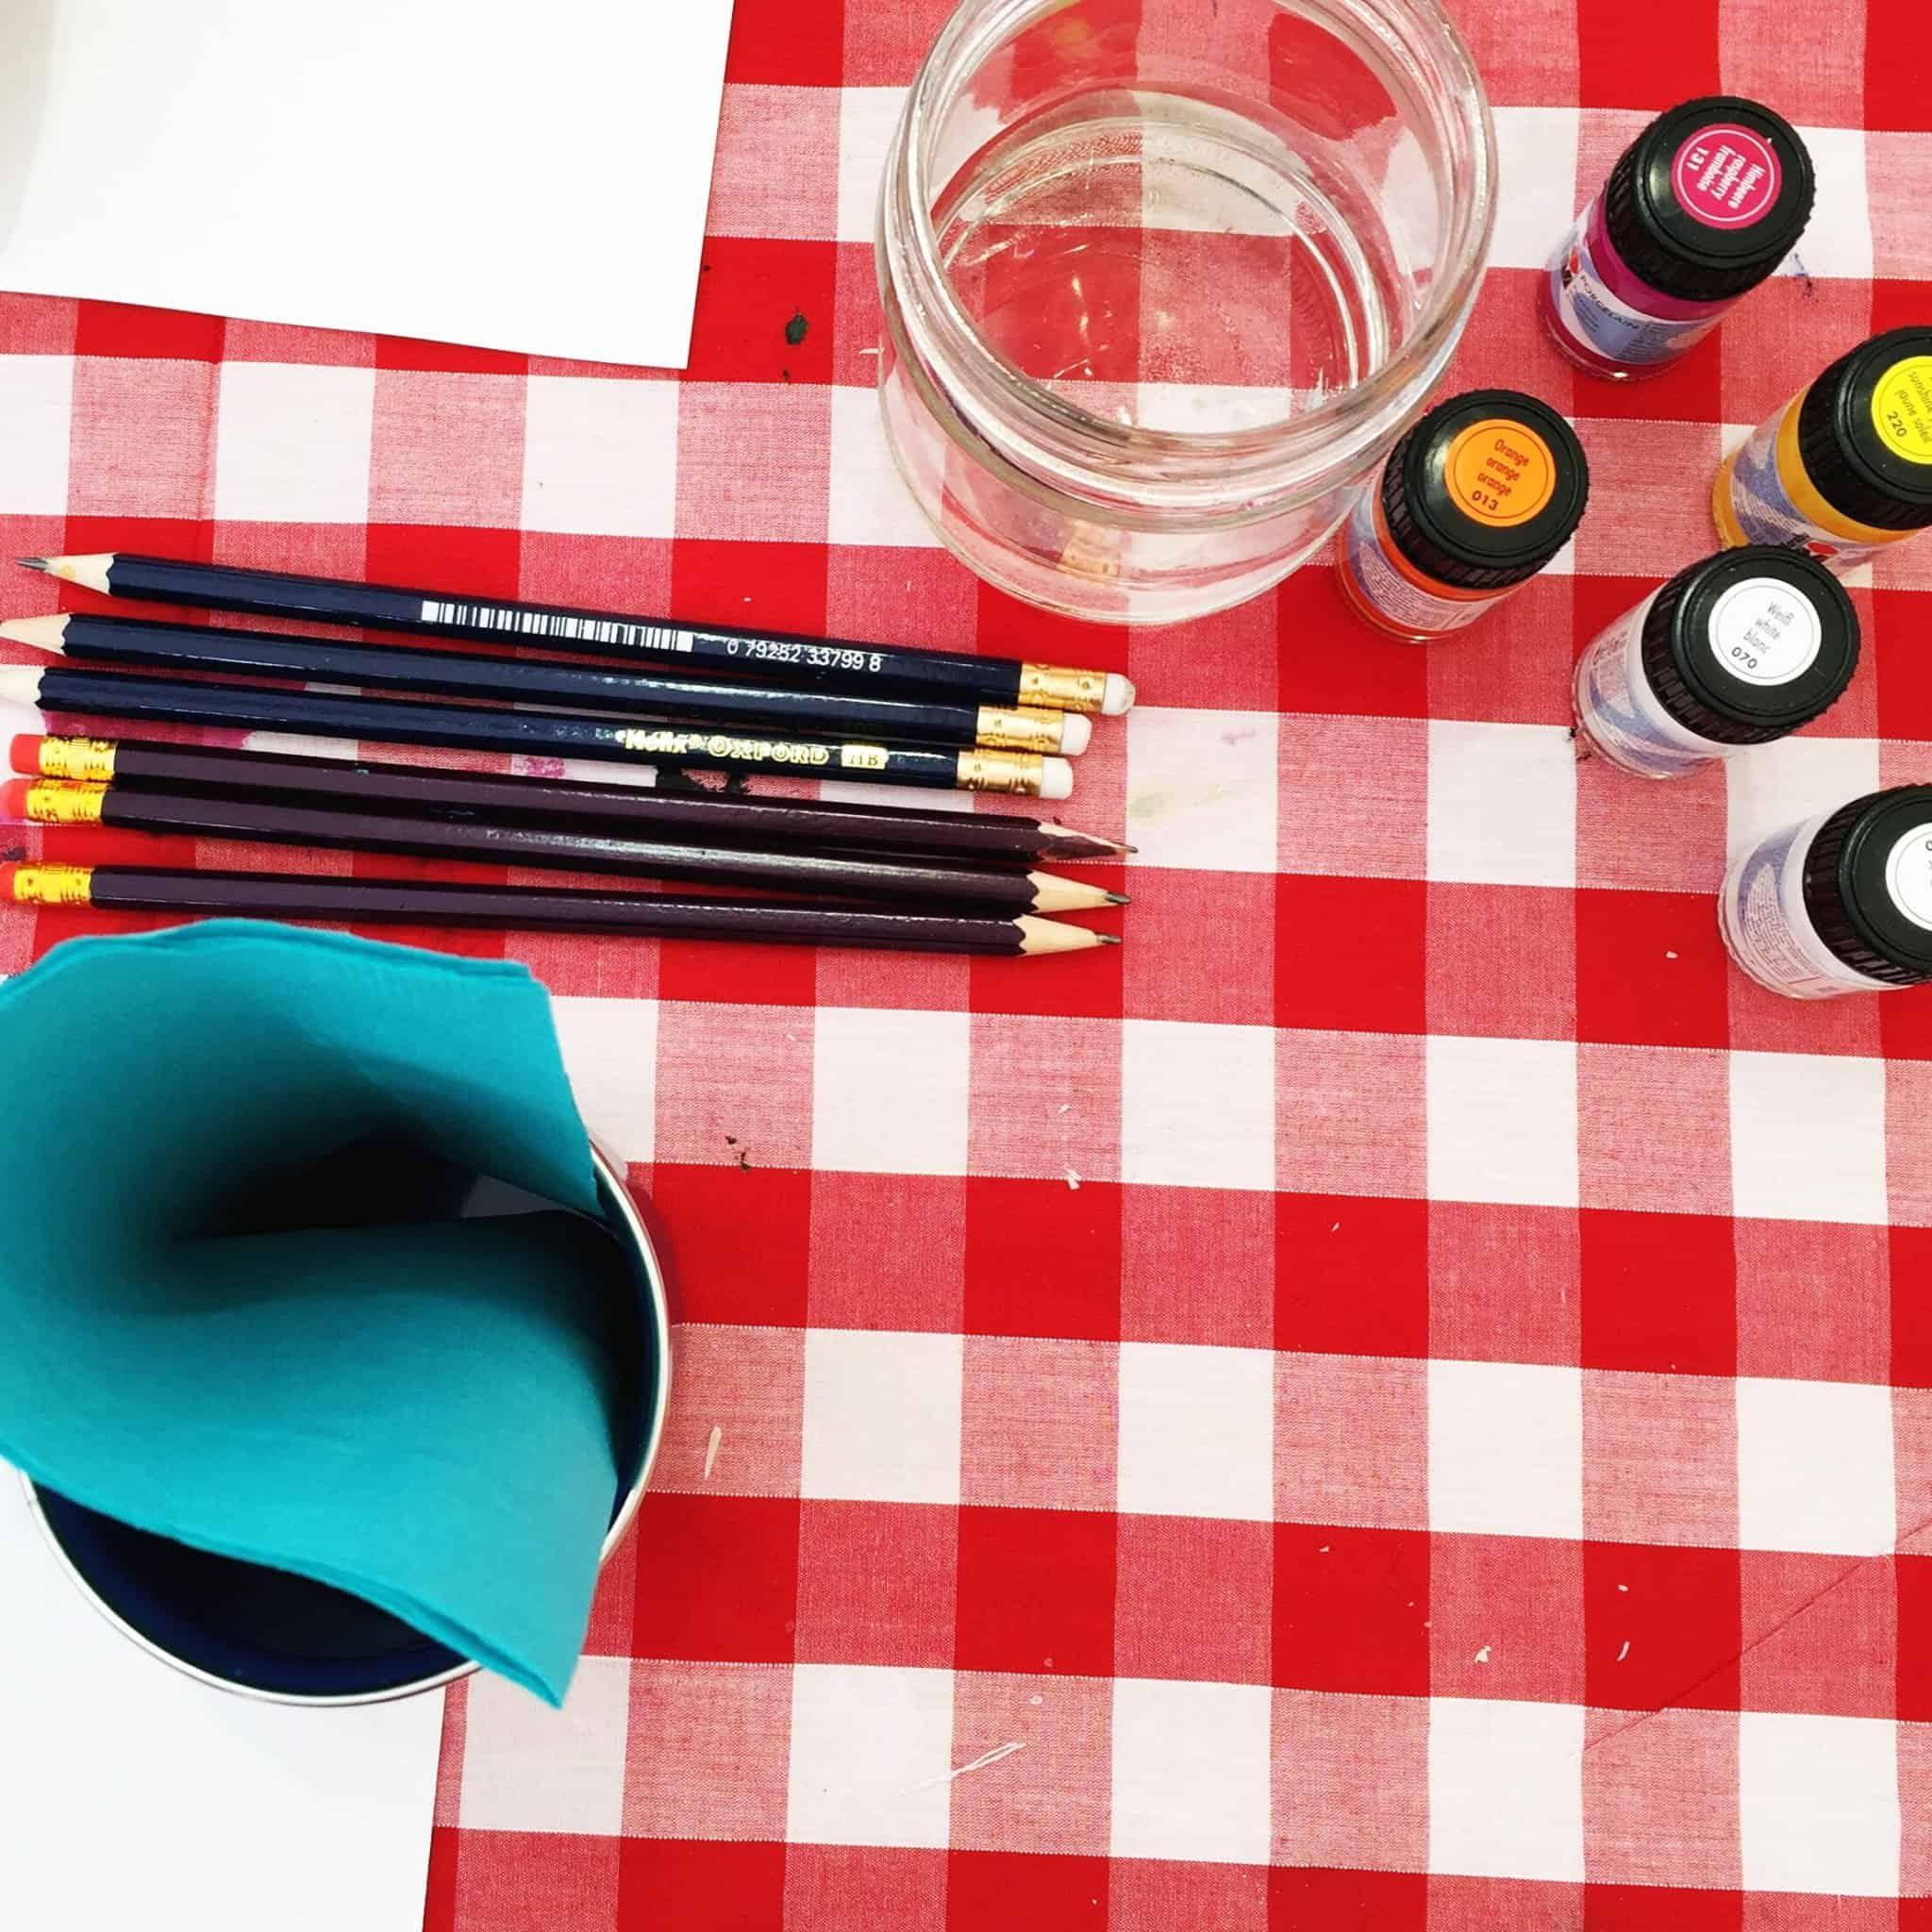 Materials for Enamel Mug Painting at The Handmade Fair 2016